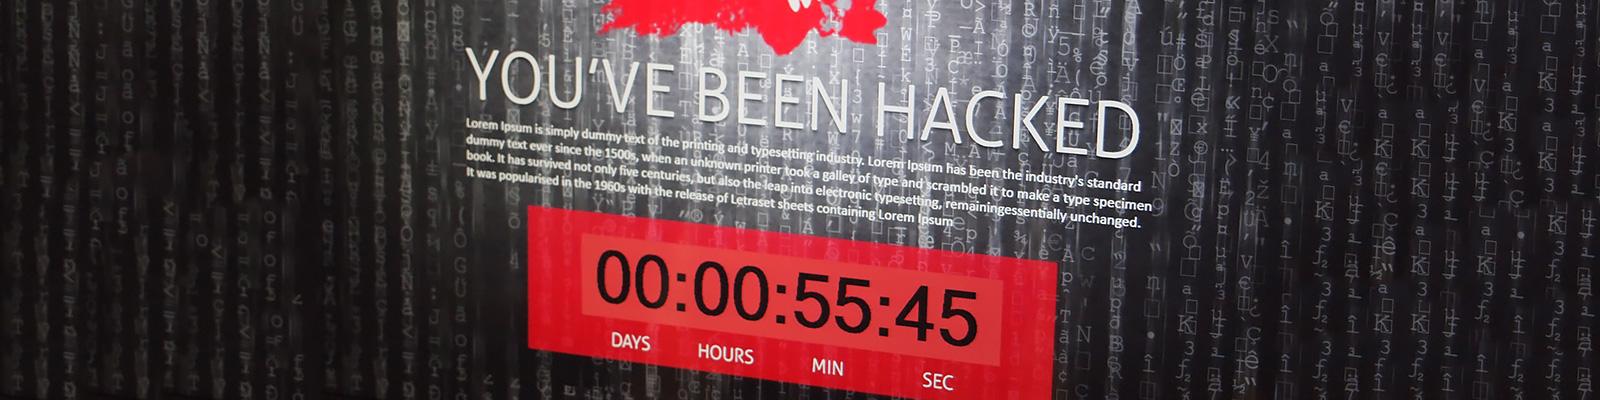 20180509-hacked-ec